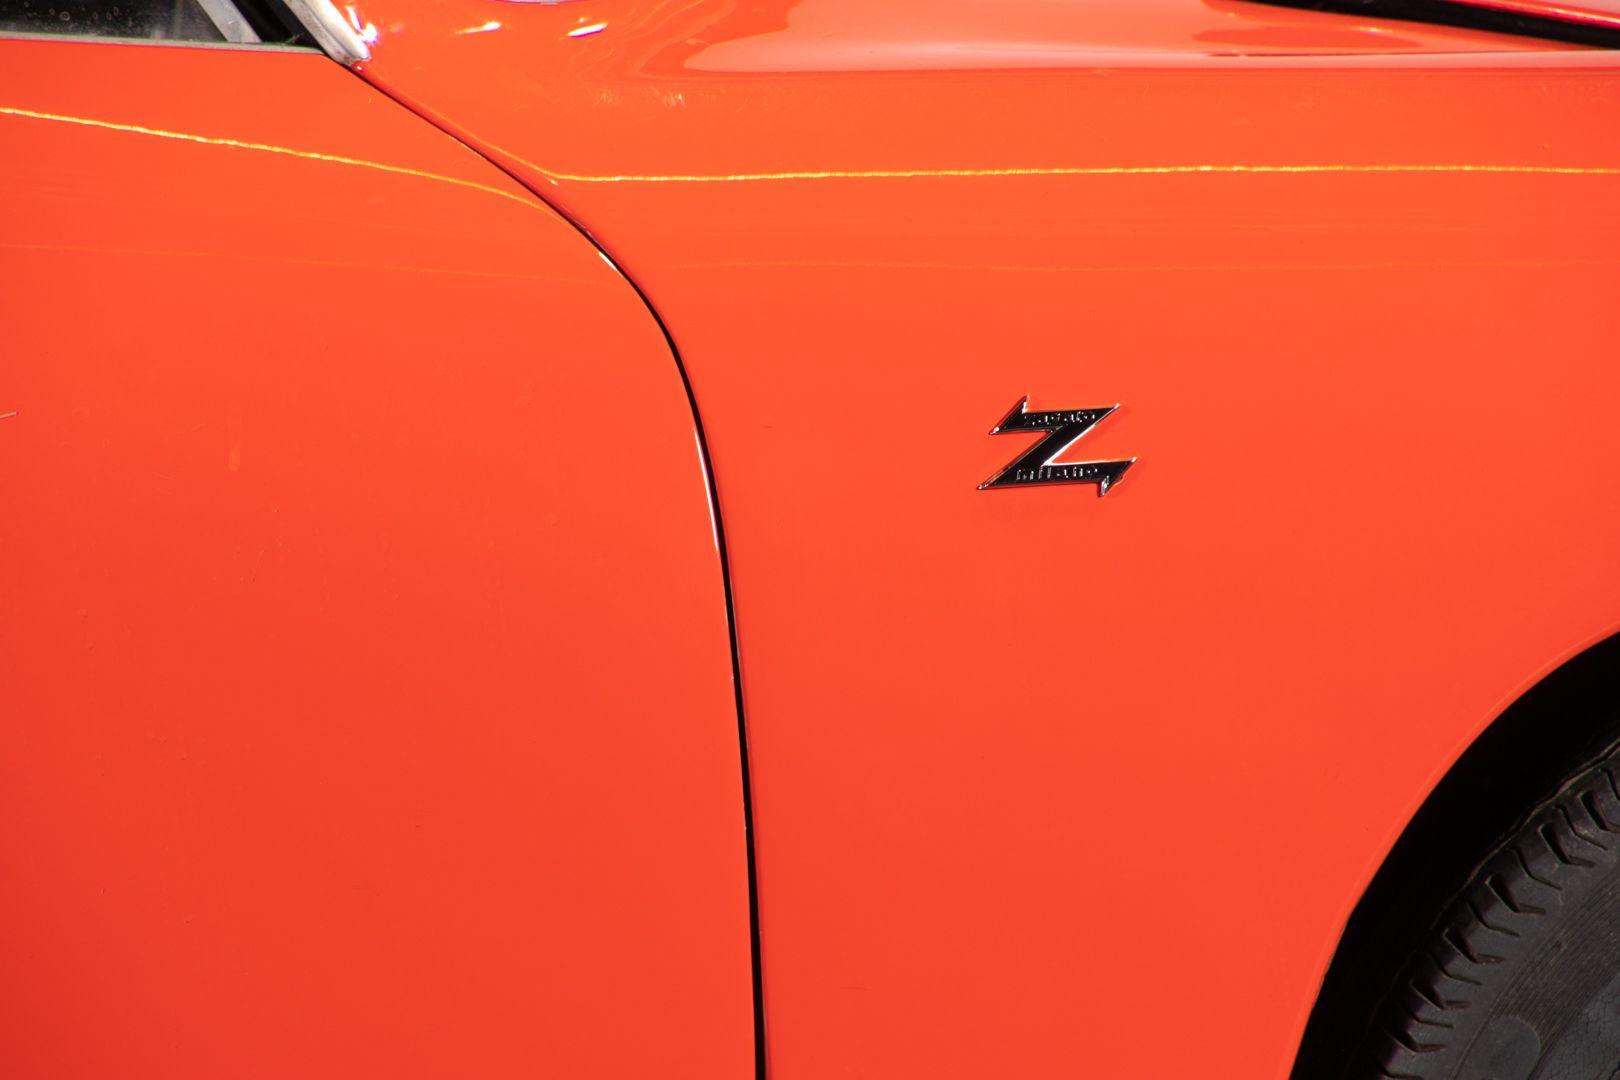 1960 Fiat Abarth 750 Bialbero record Monza 33317